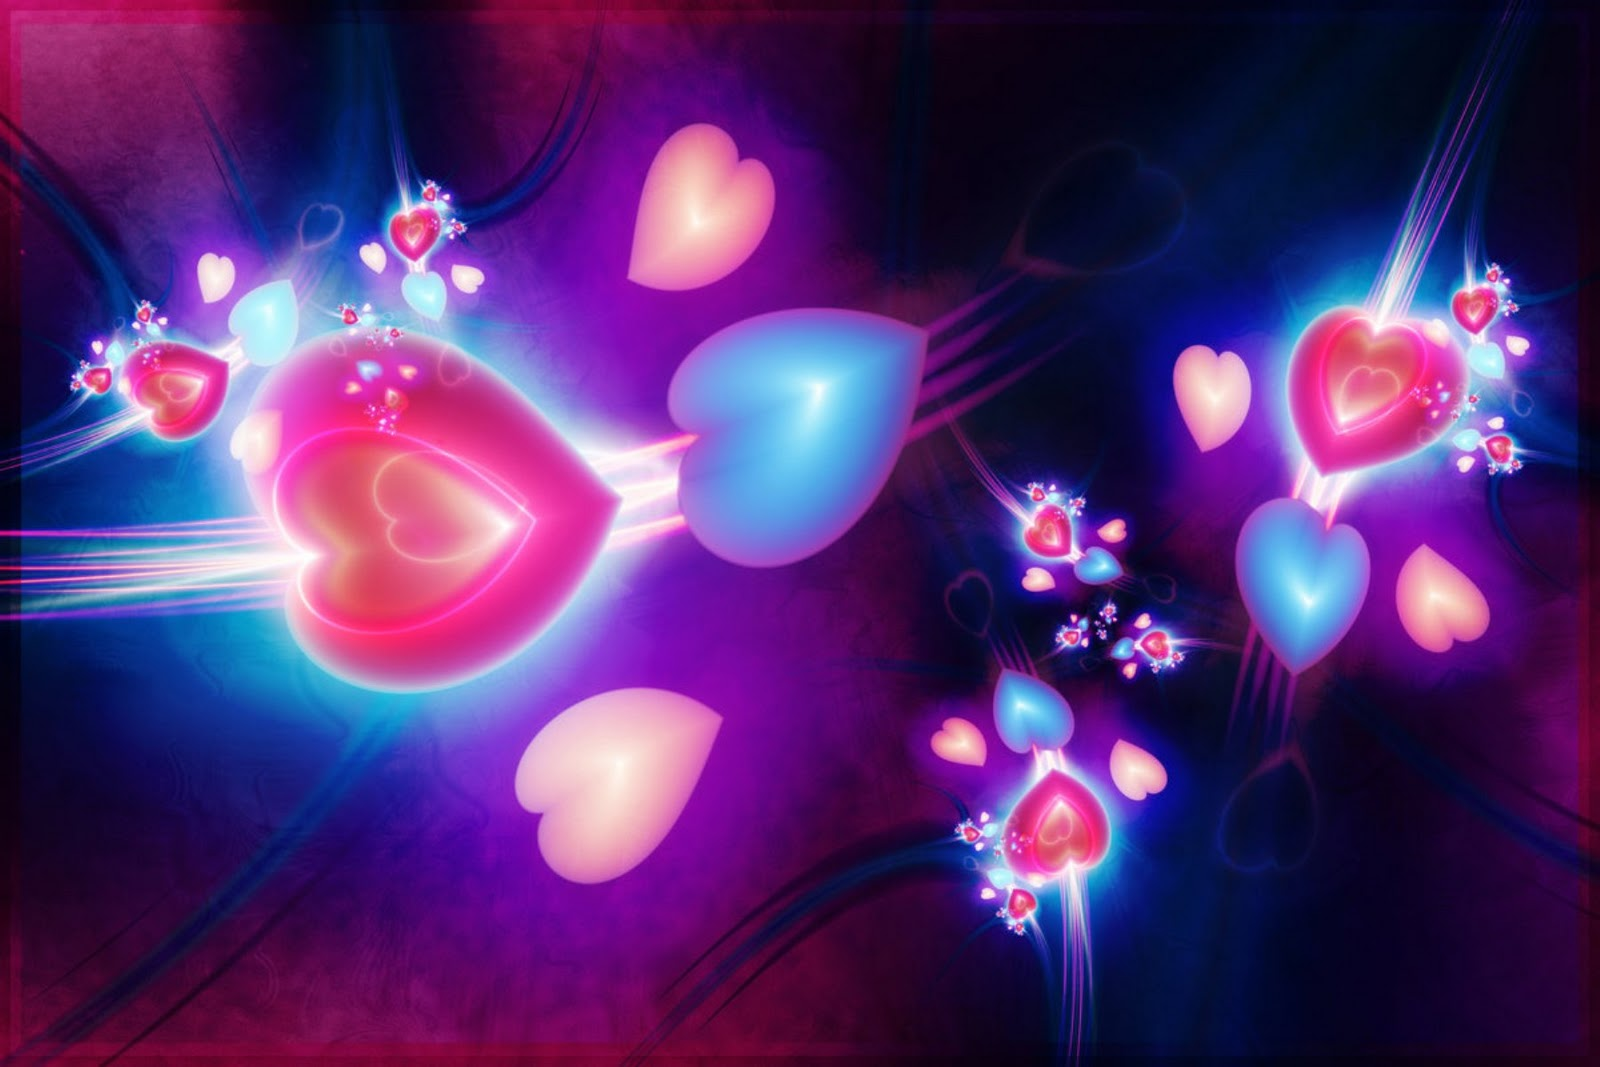 Bleeding heart Images and Stock Photos. 972 Bleeding  - bleeding heart flowers wallpapers